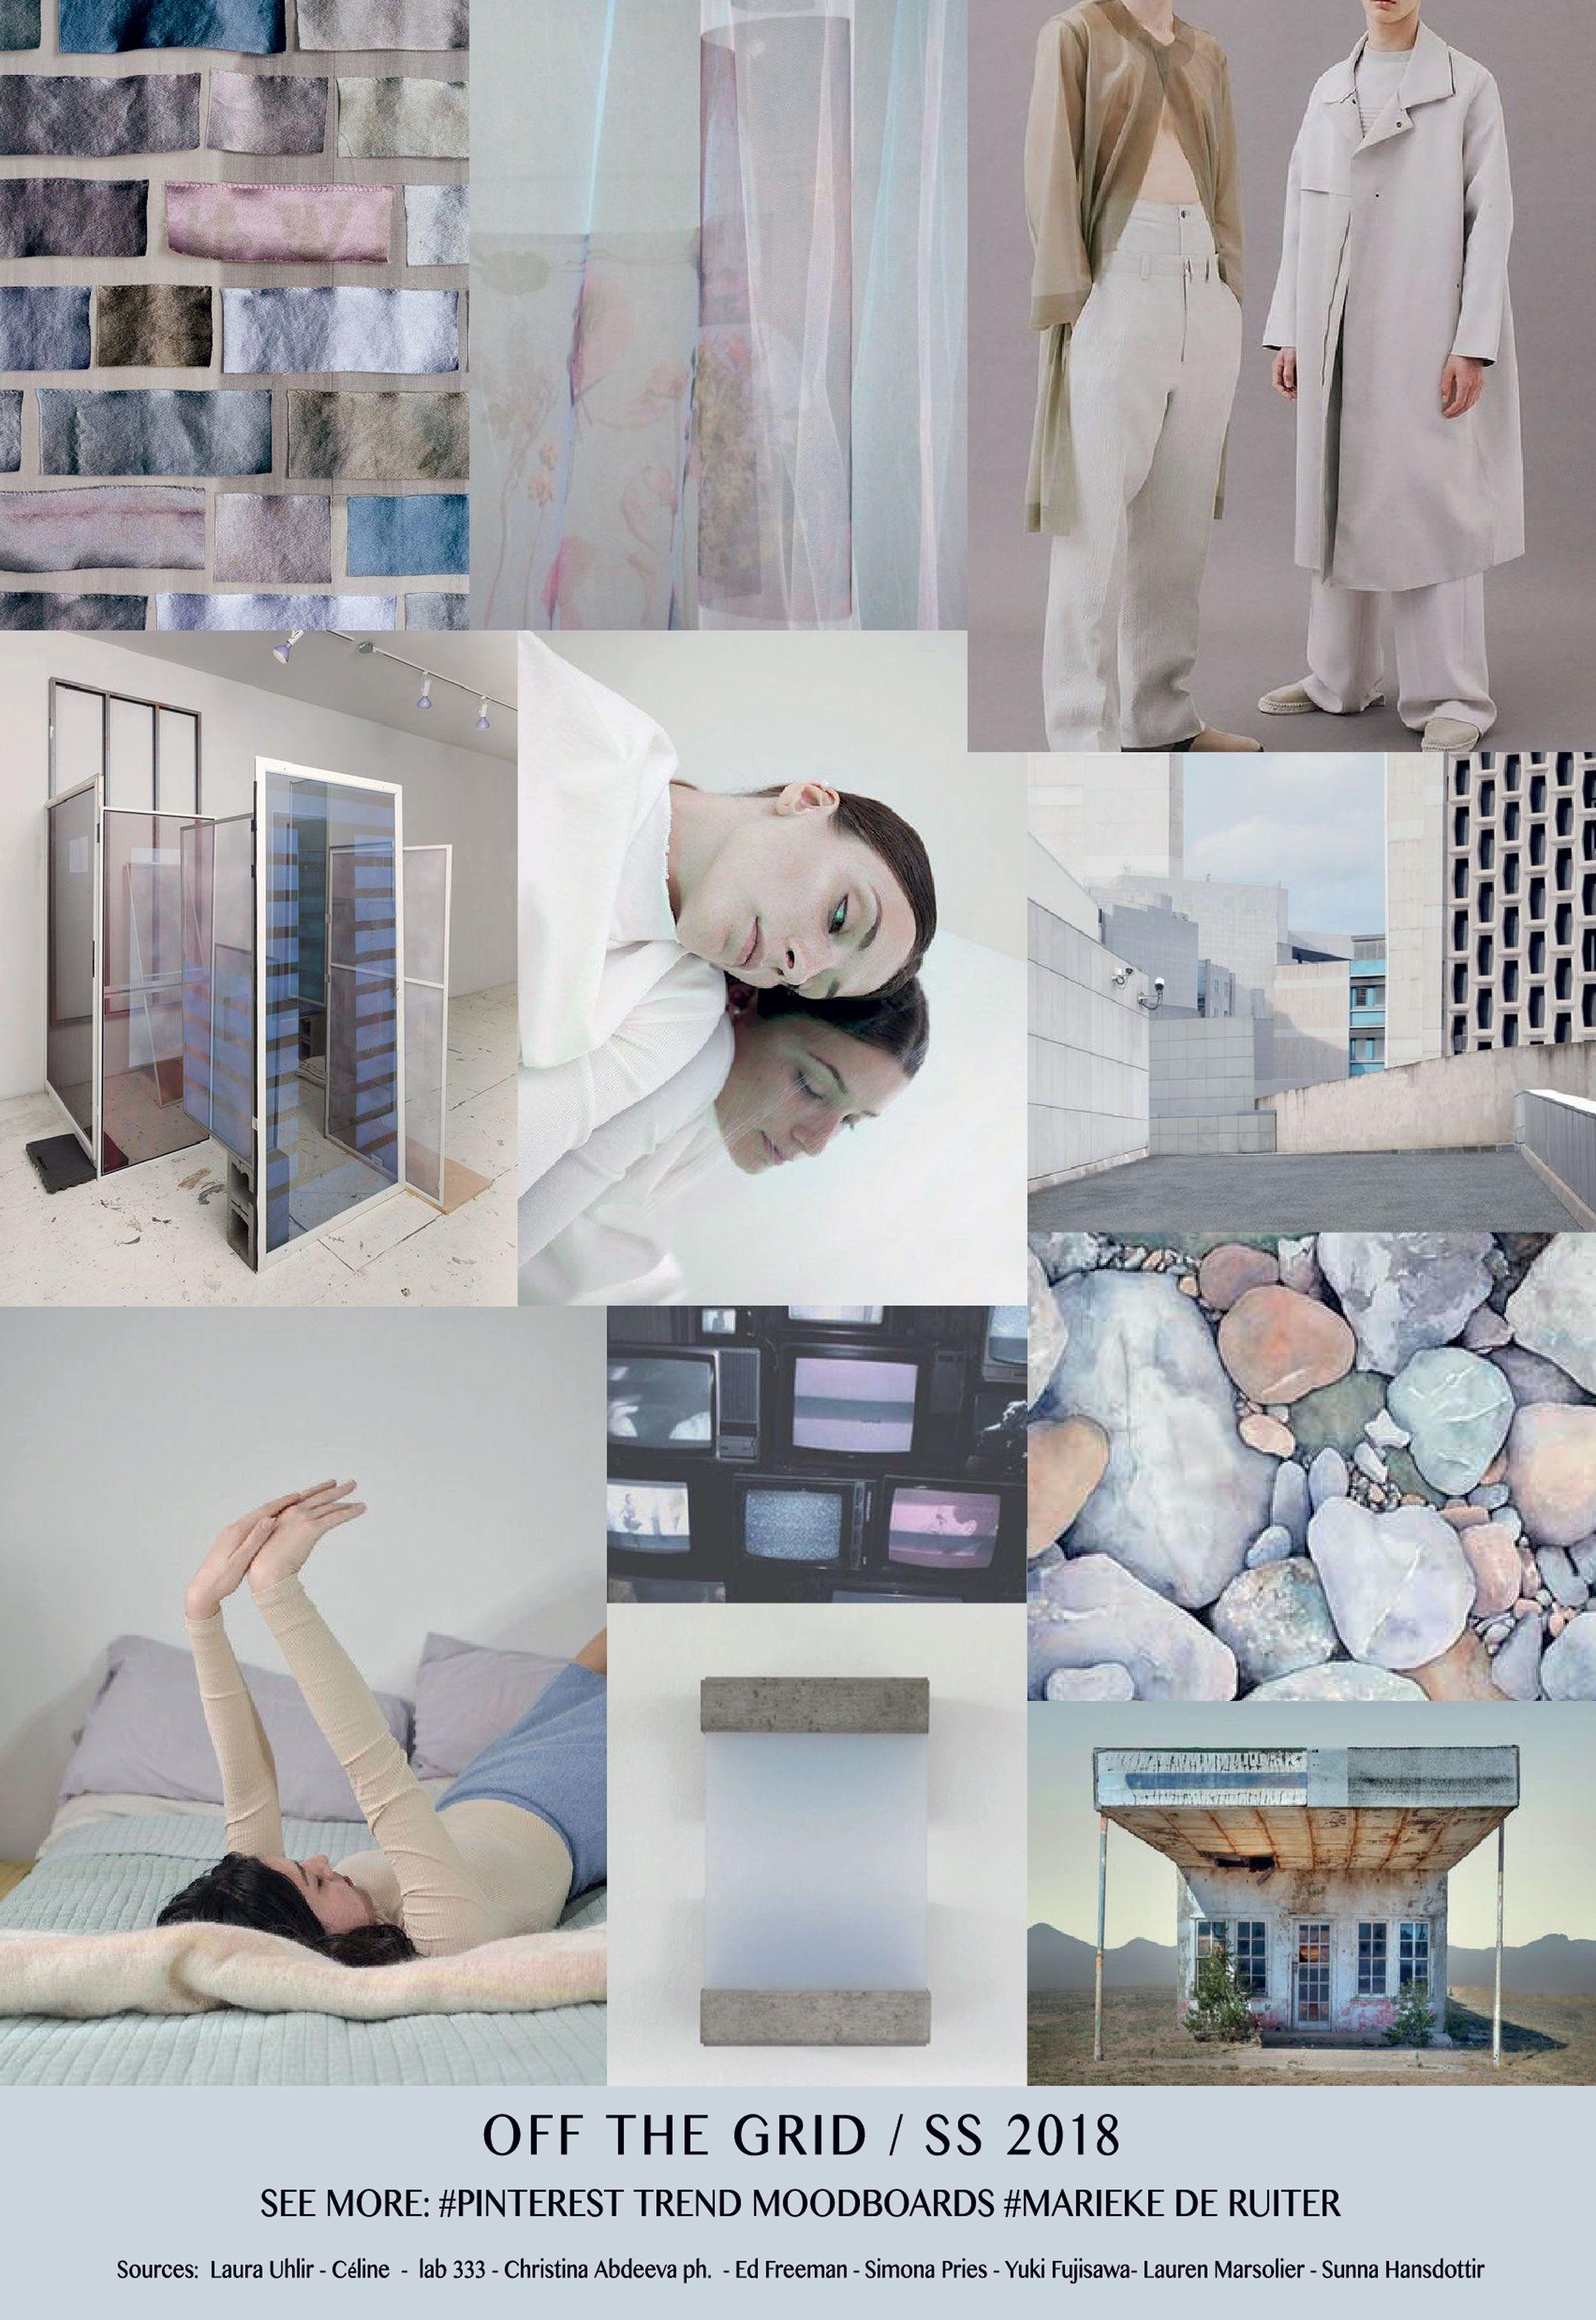 off the grid trend ss 2018 marieke de ruiter trends. Black Bedroom Furniture Sets. Home Design Ideas